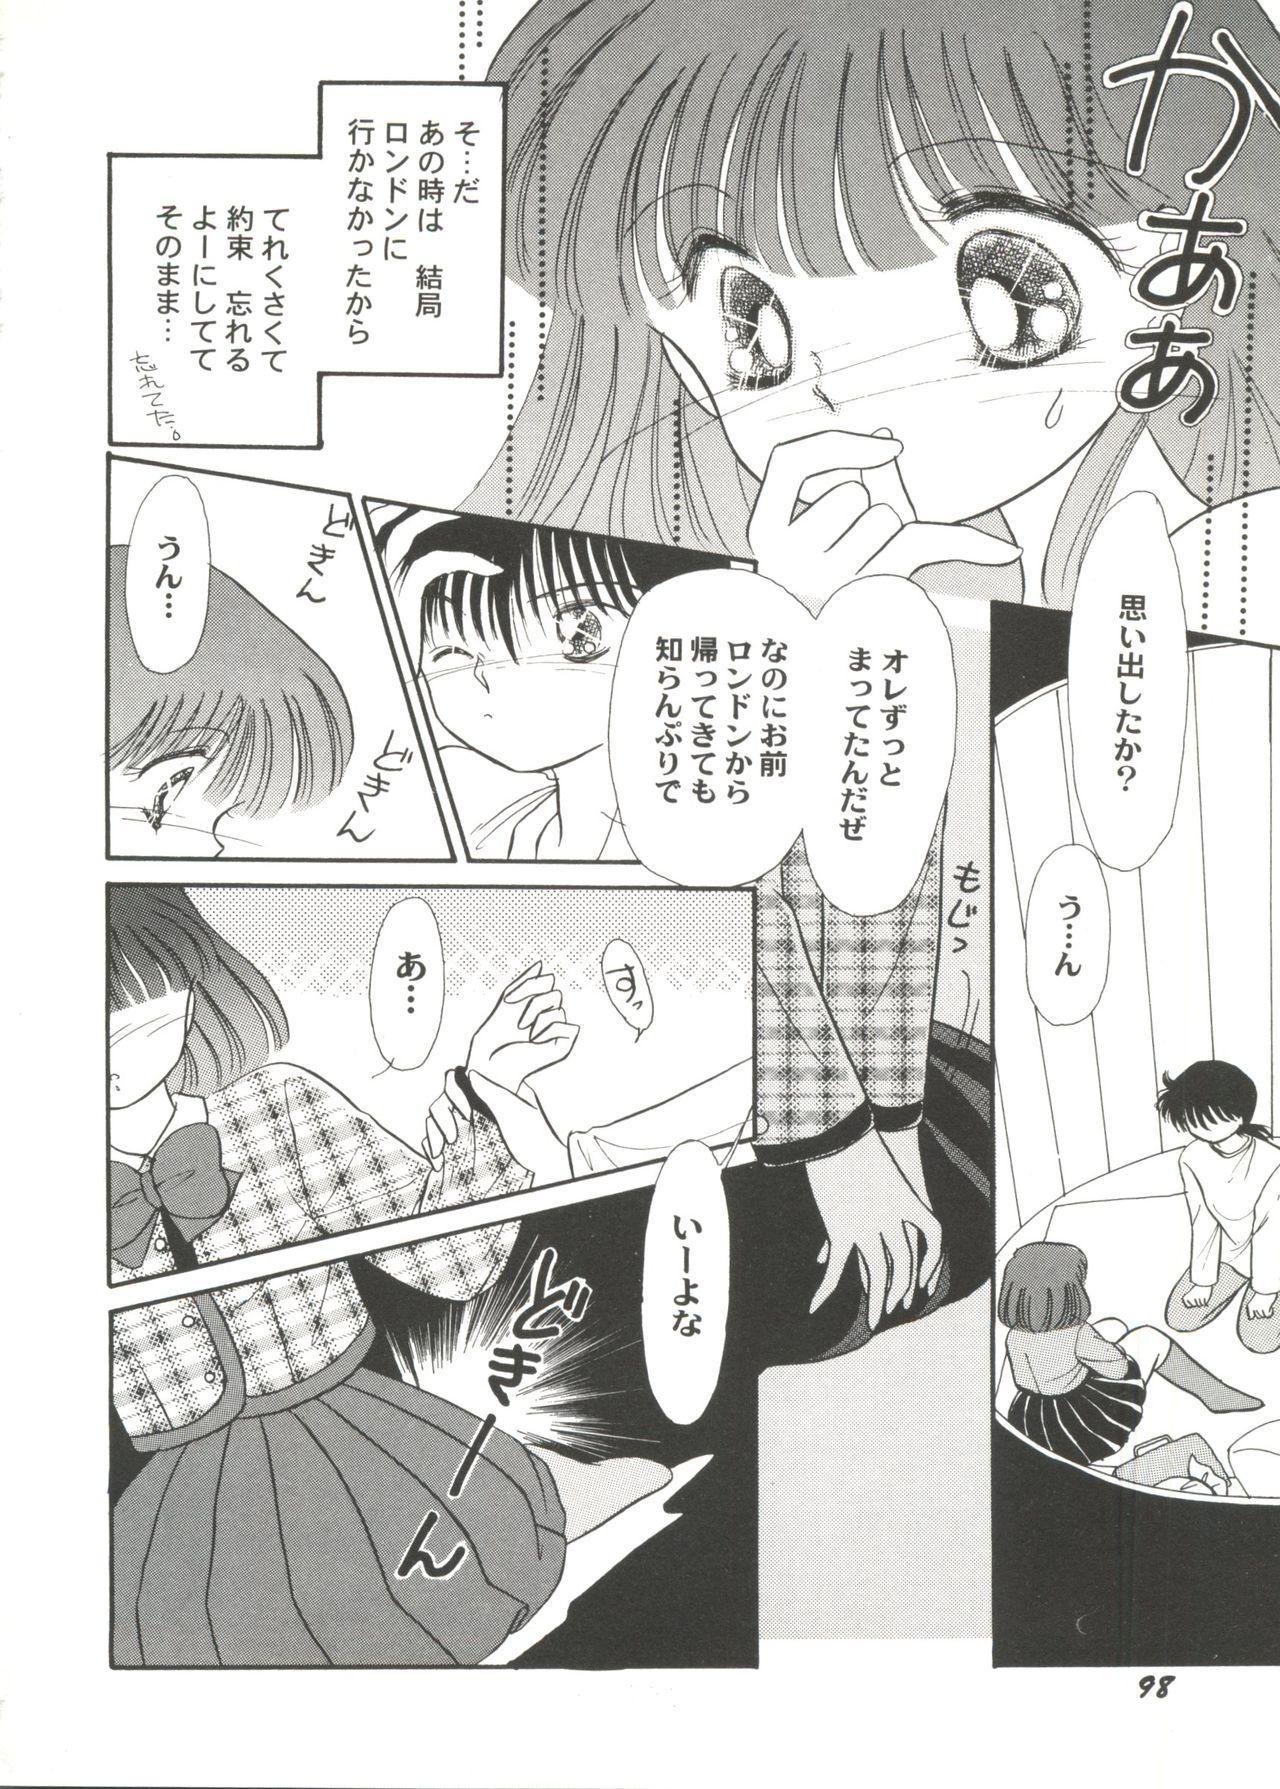 Bishoujo Doujin Peach Club - Pretty Gal's Fanzine Peach Club 9 99